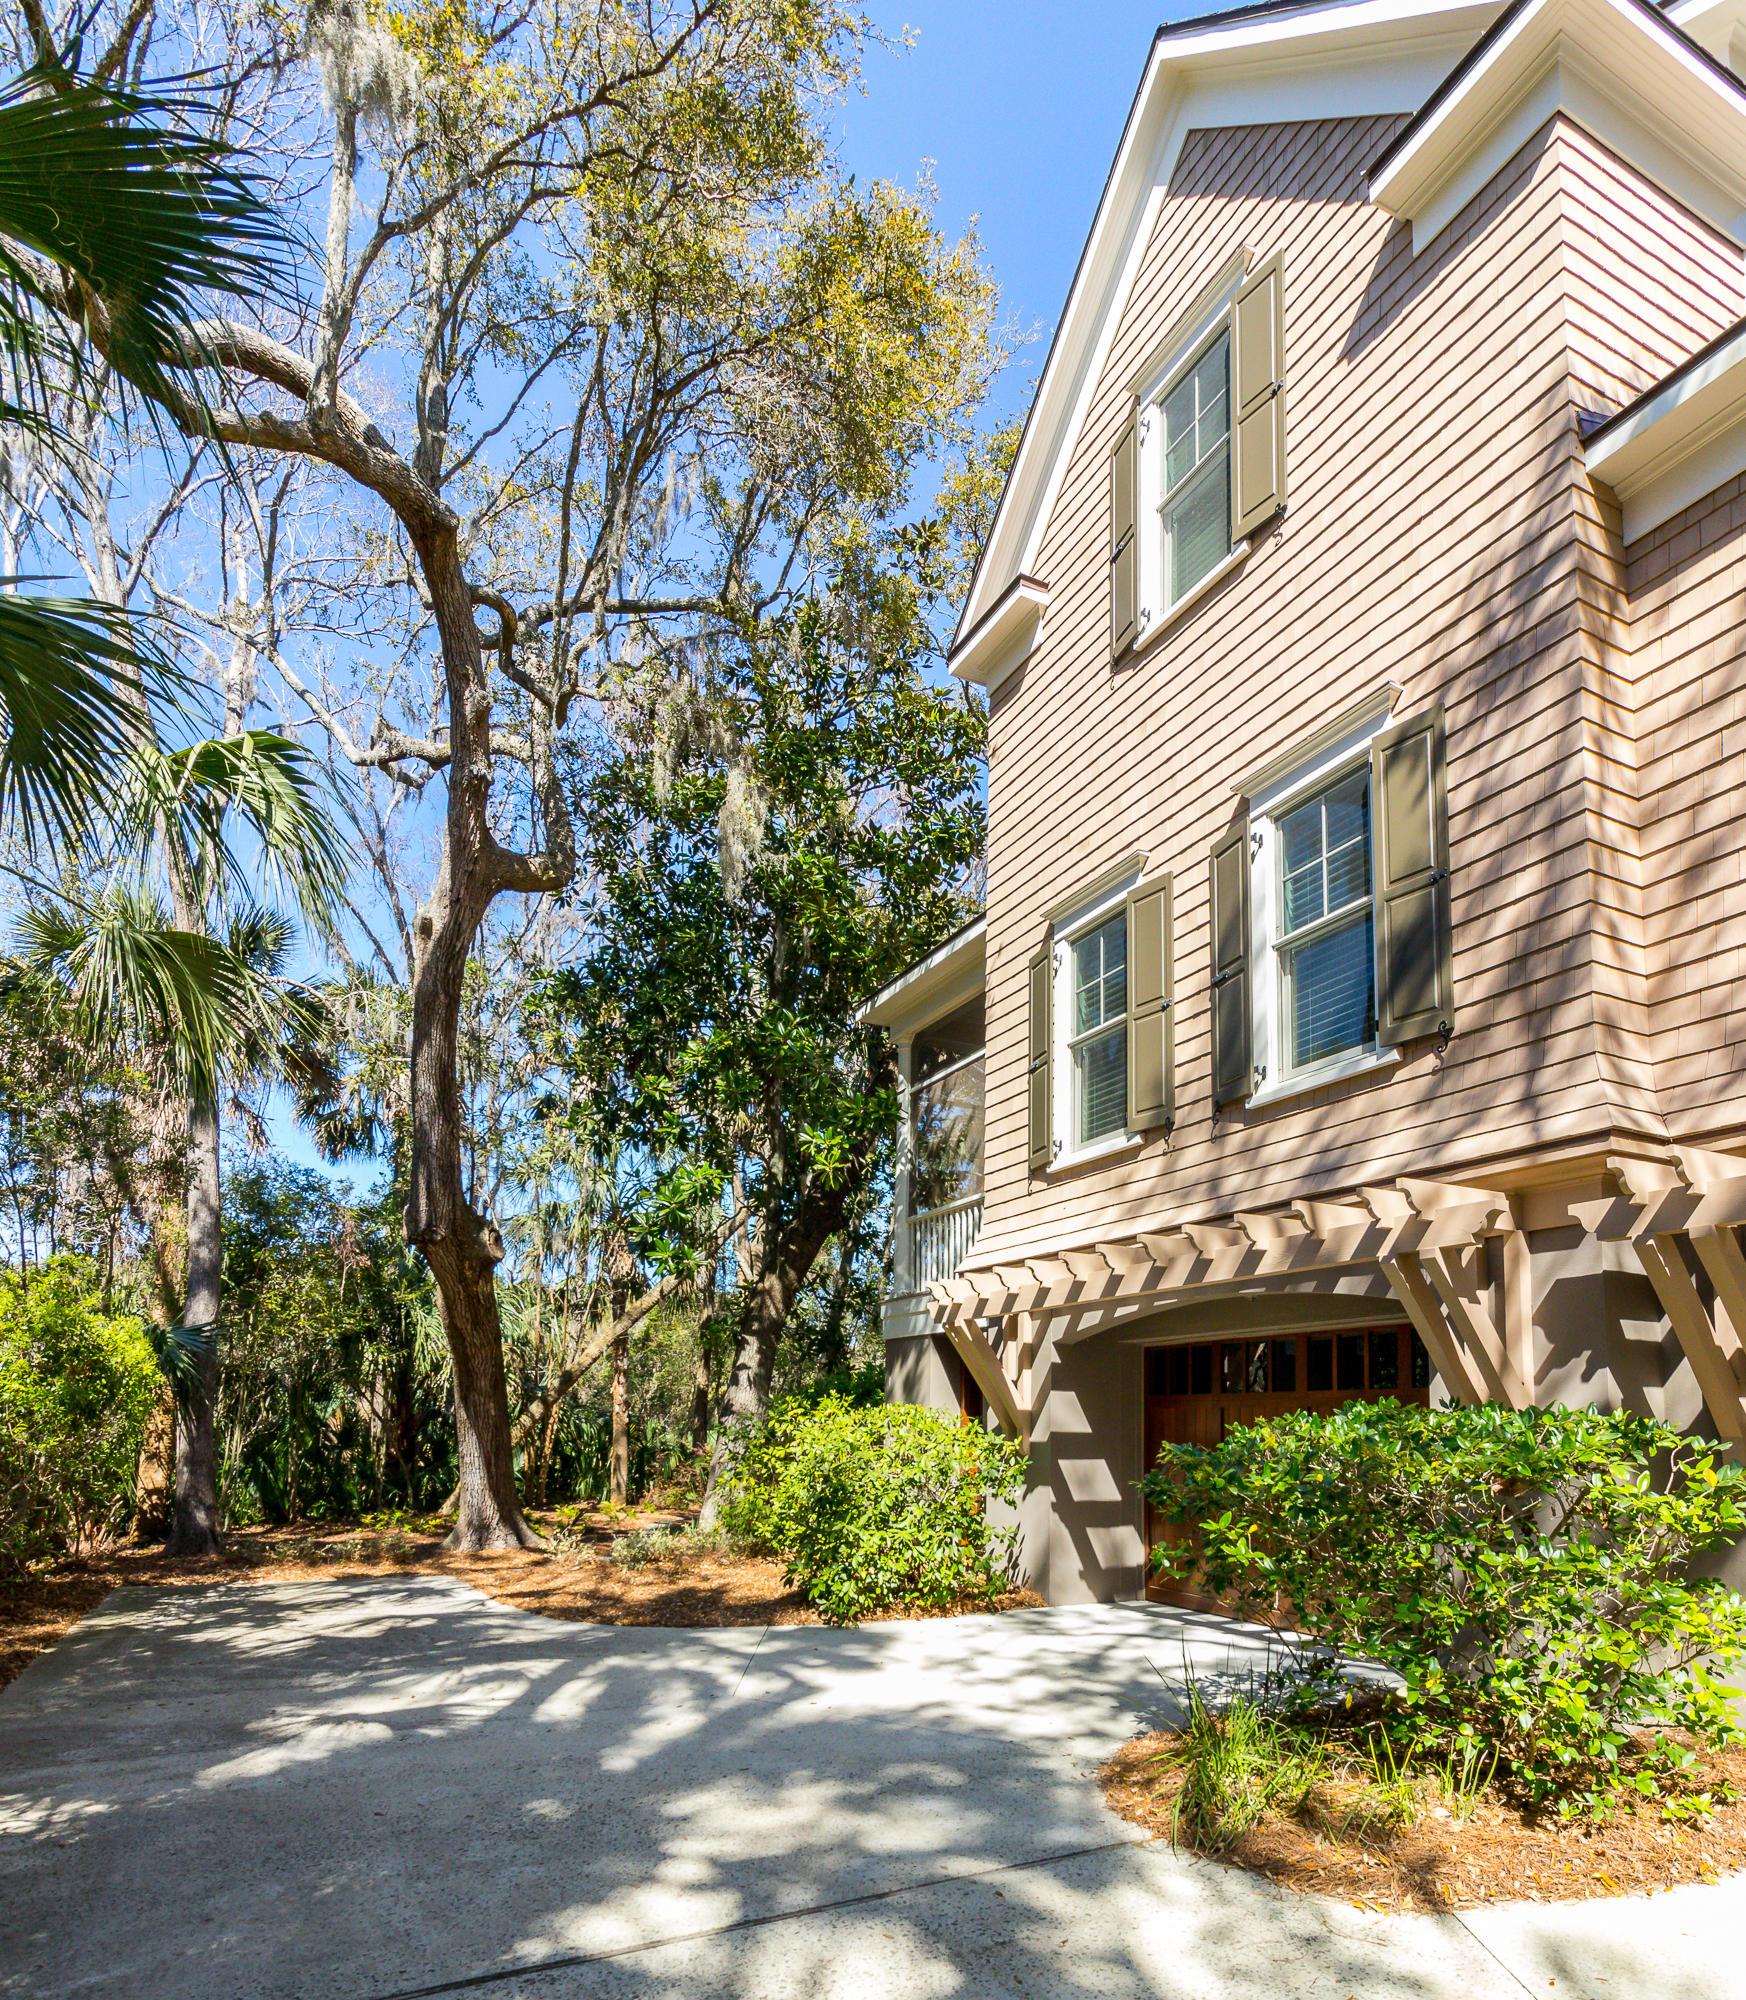 Egret/Pintail Homes For Sale - 117 Bufflehead, Kiawah Island, SC - 7